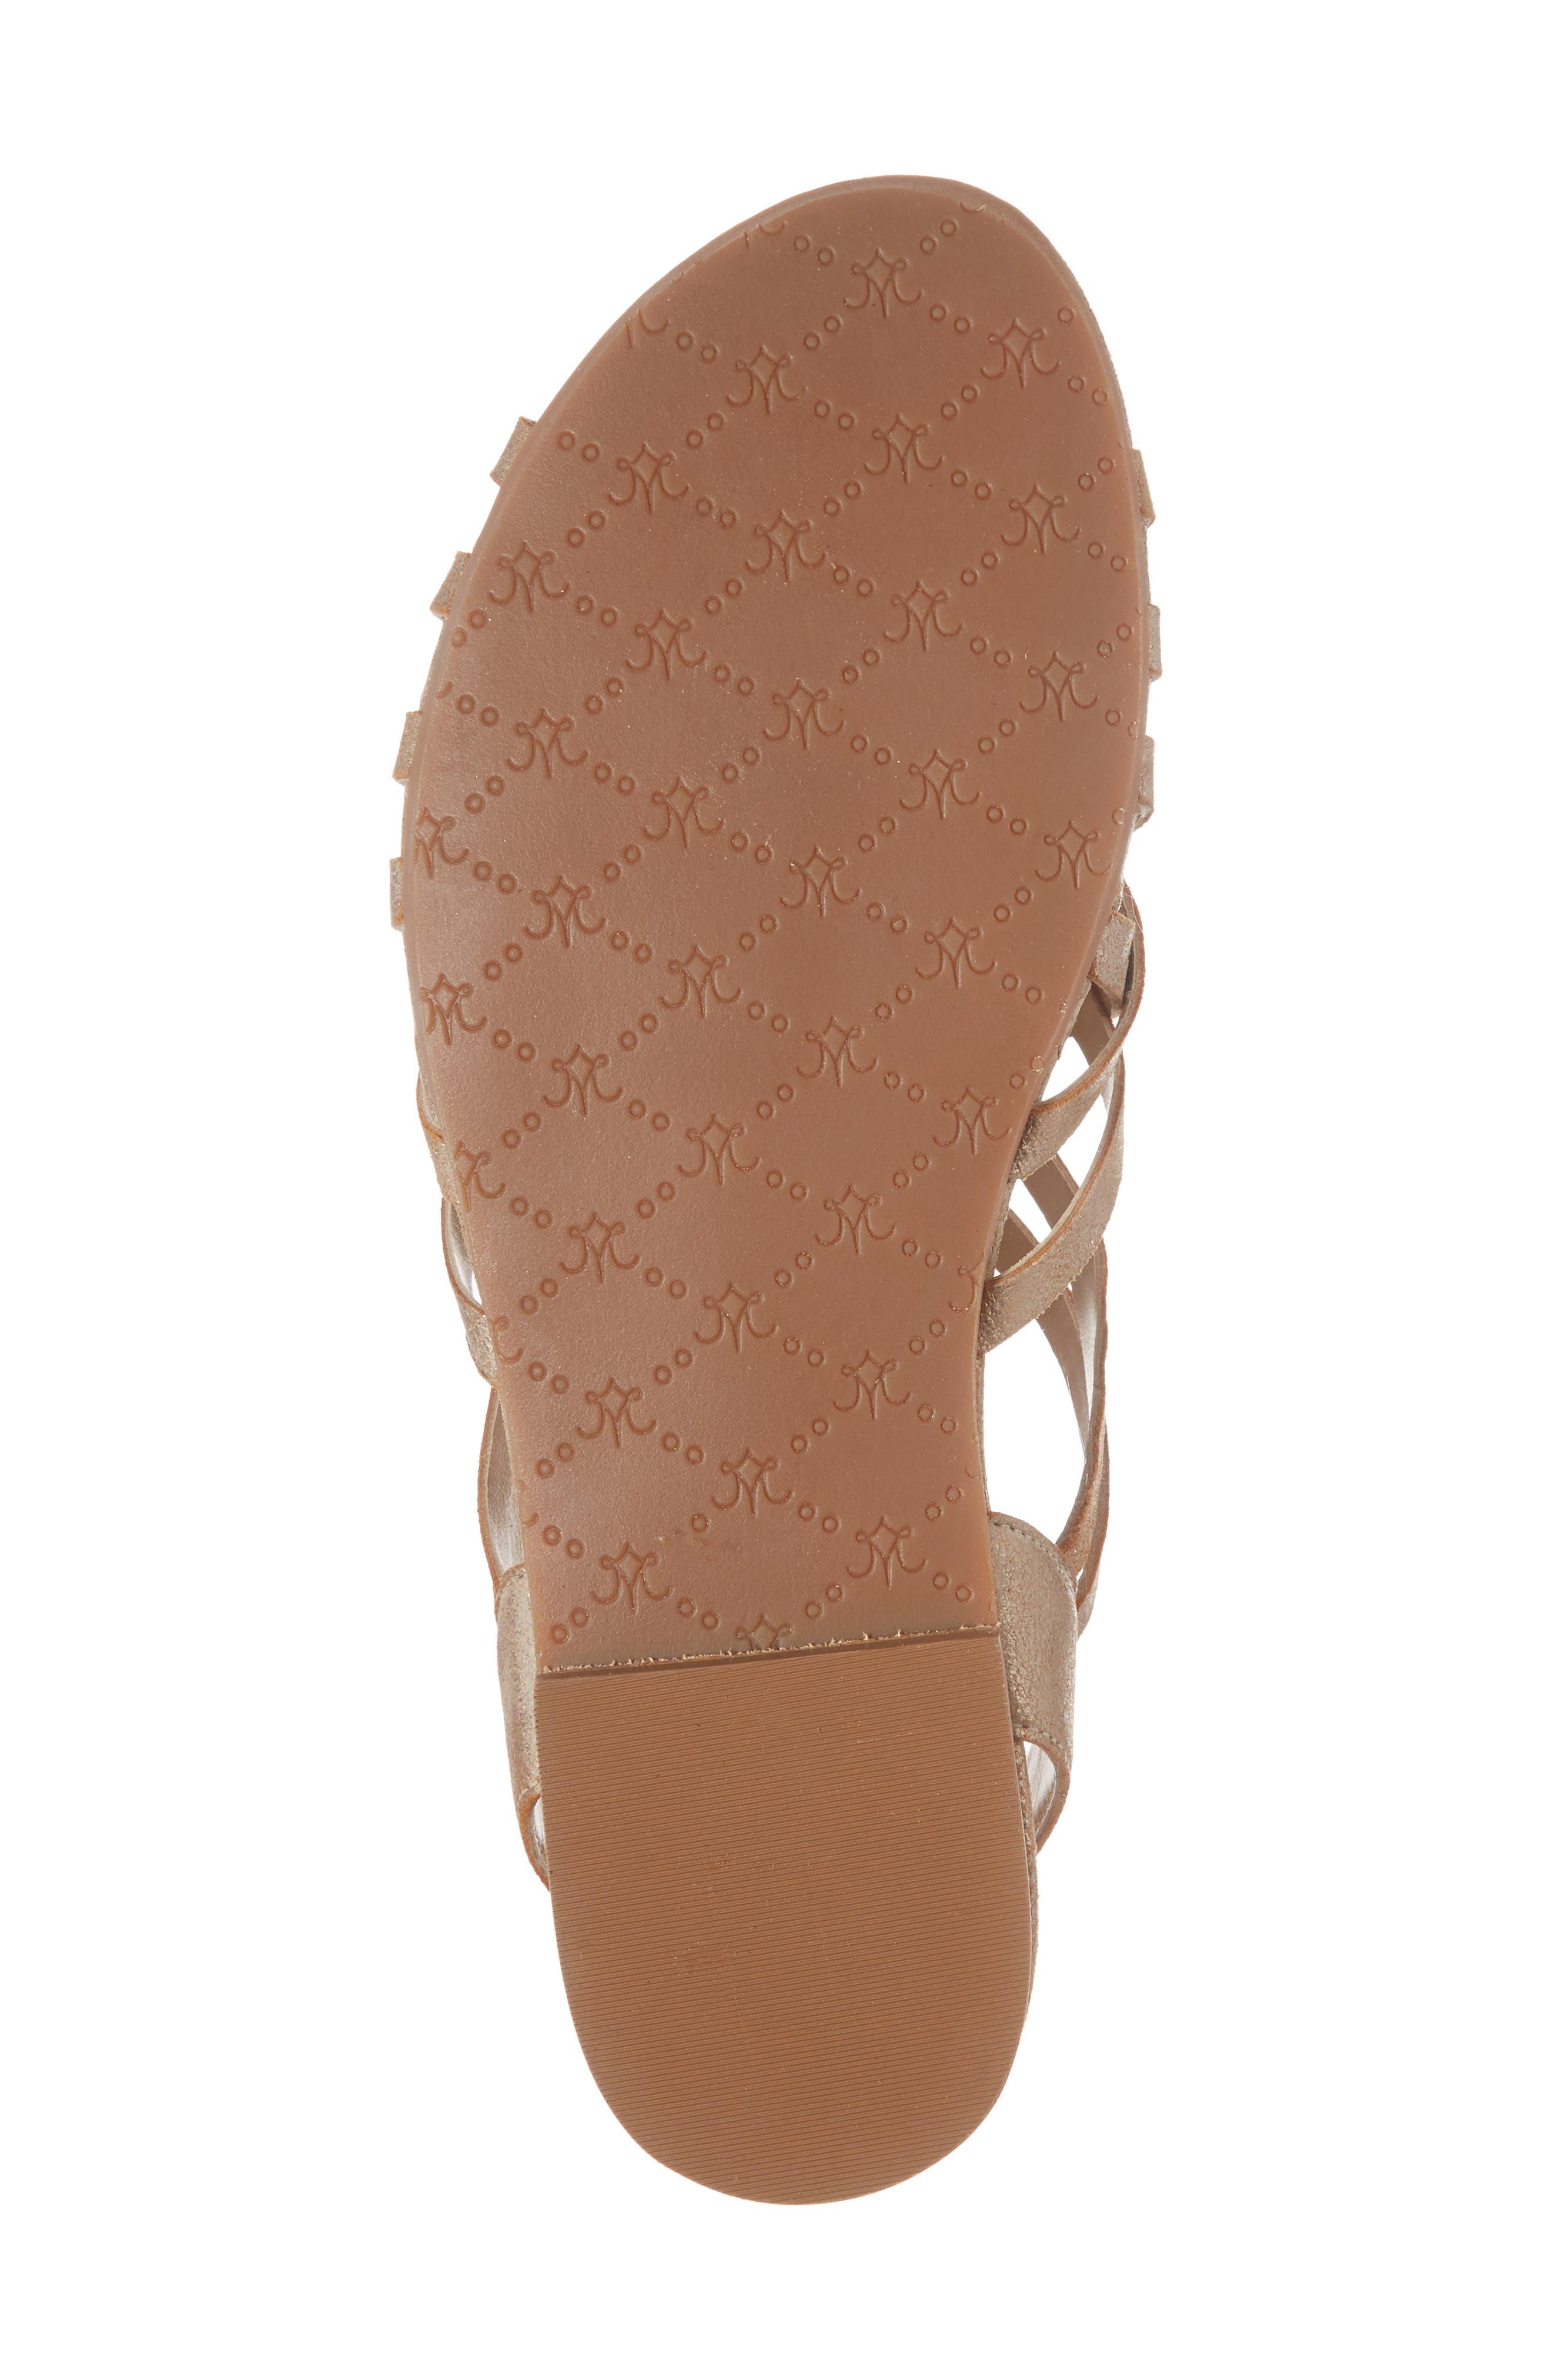 Hallie Sandal,                             Alternate thumbnail 6, color,                             Copper Leather